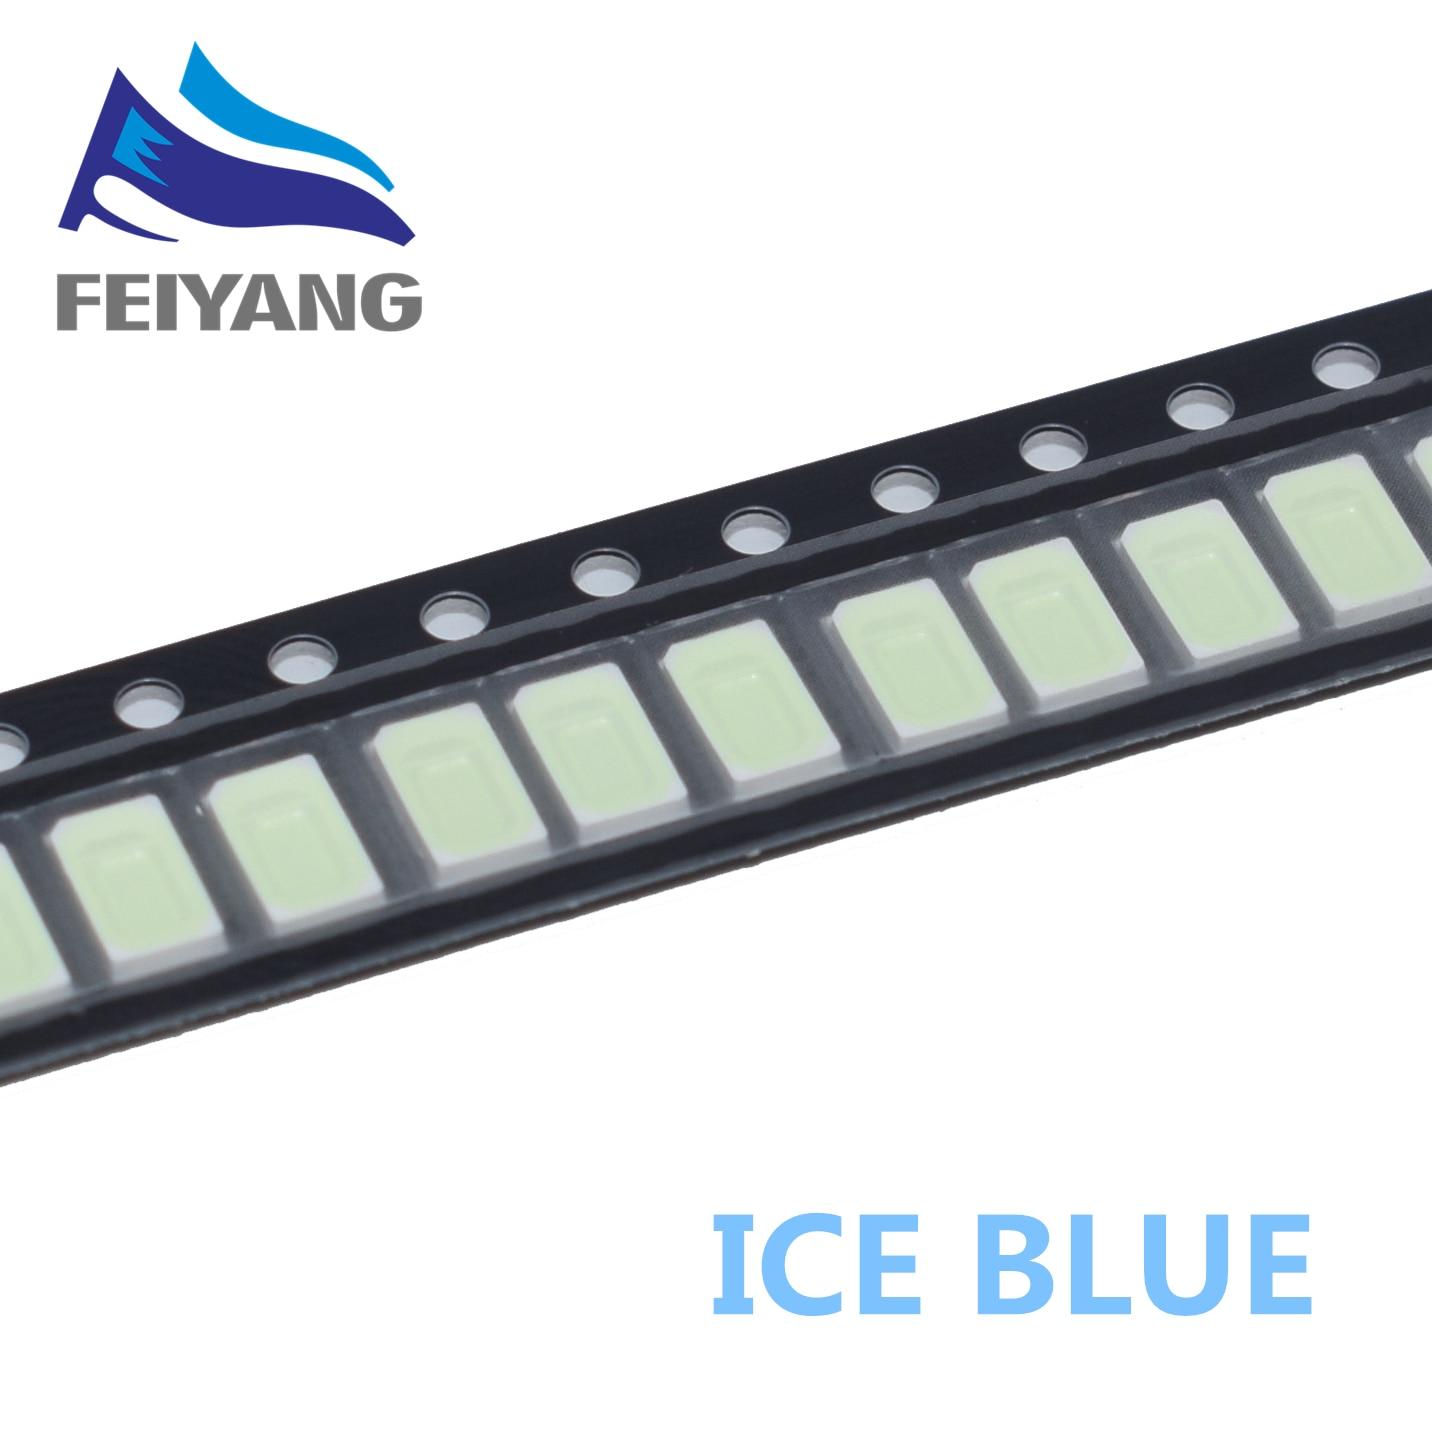 50pcs XIASONGXIN LIGHT 5730 diode Ice blue SMD LED 5630 Light emitting Diode